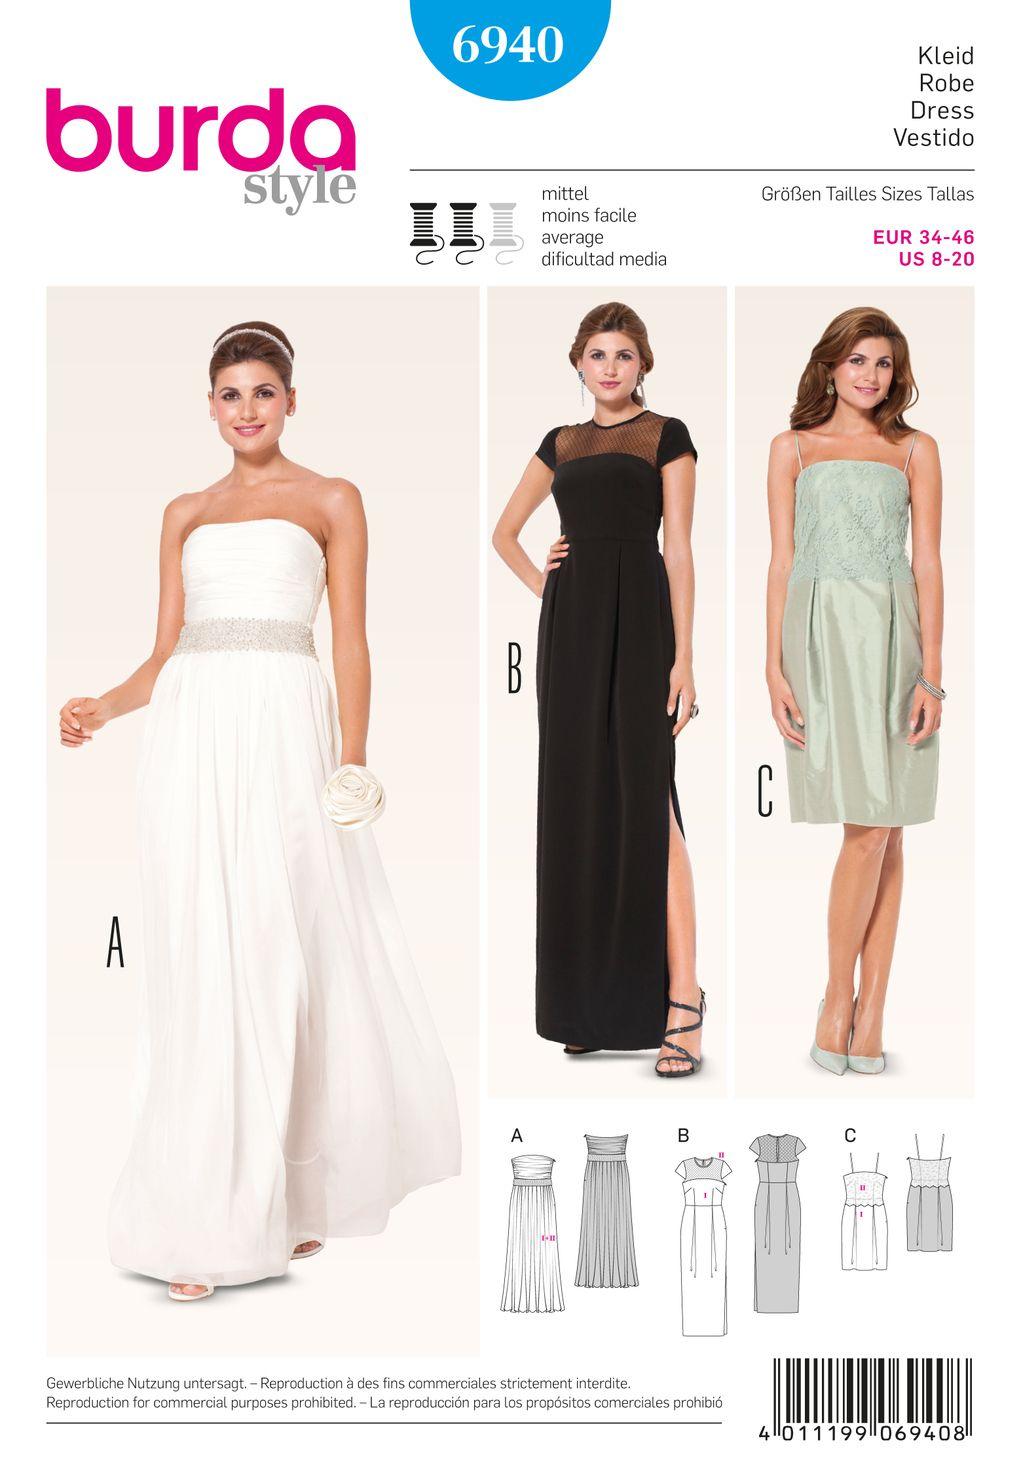 Schnittmuster Kleid F/S 15 #15A  Schnittmuster abendkleid